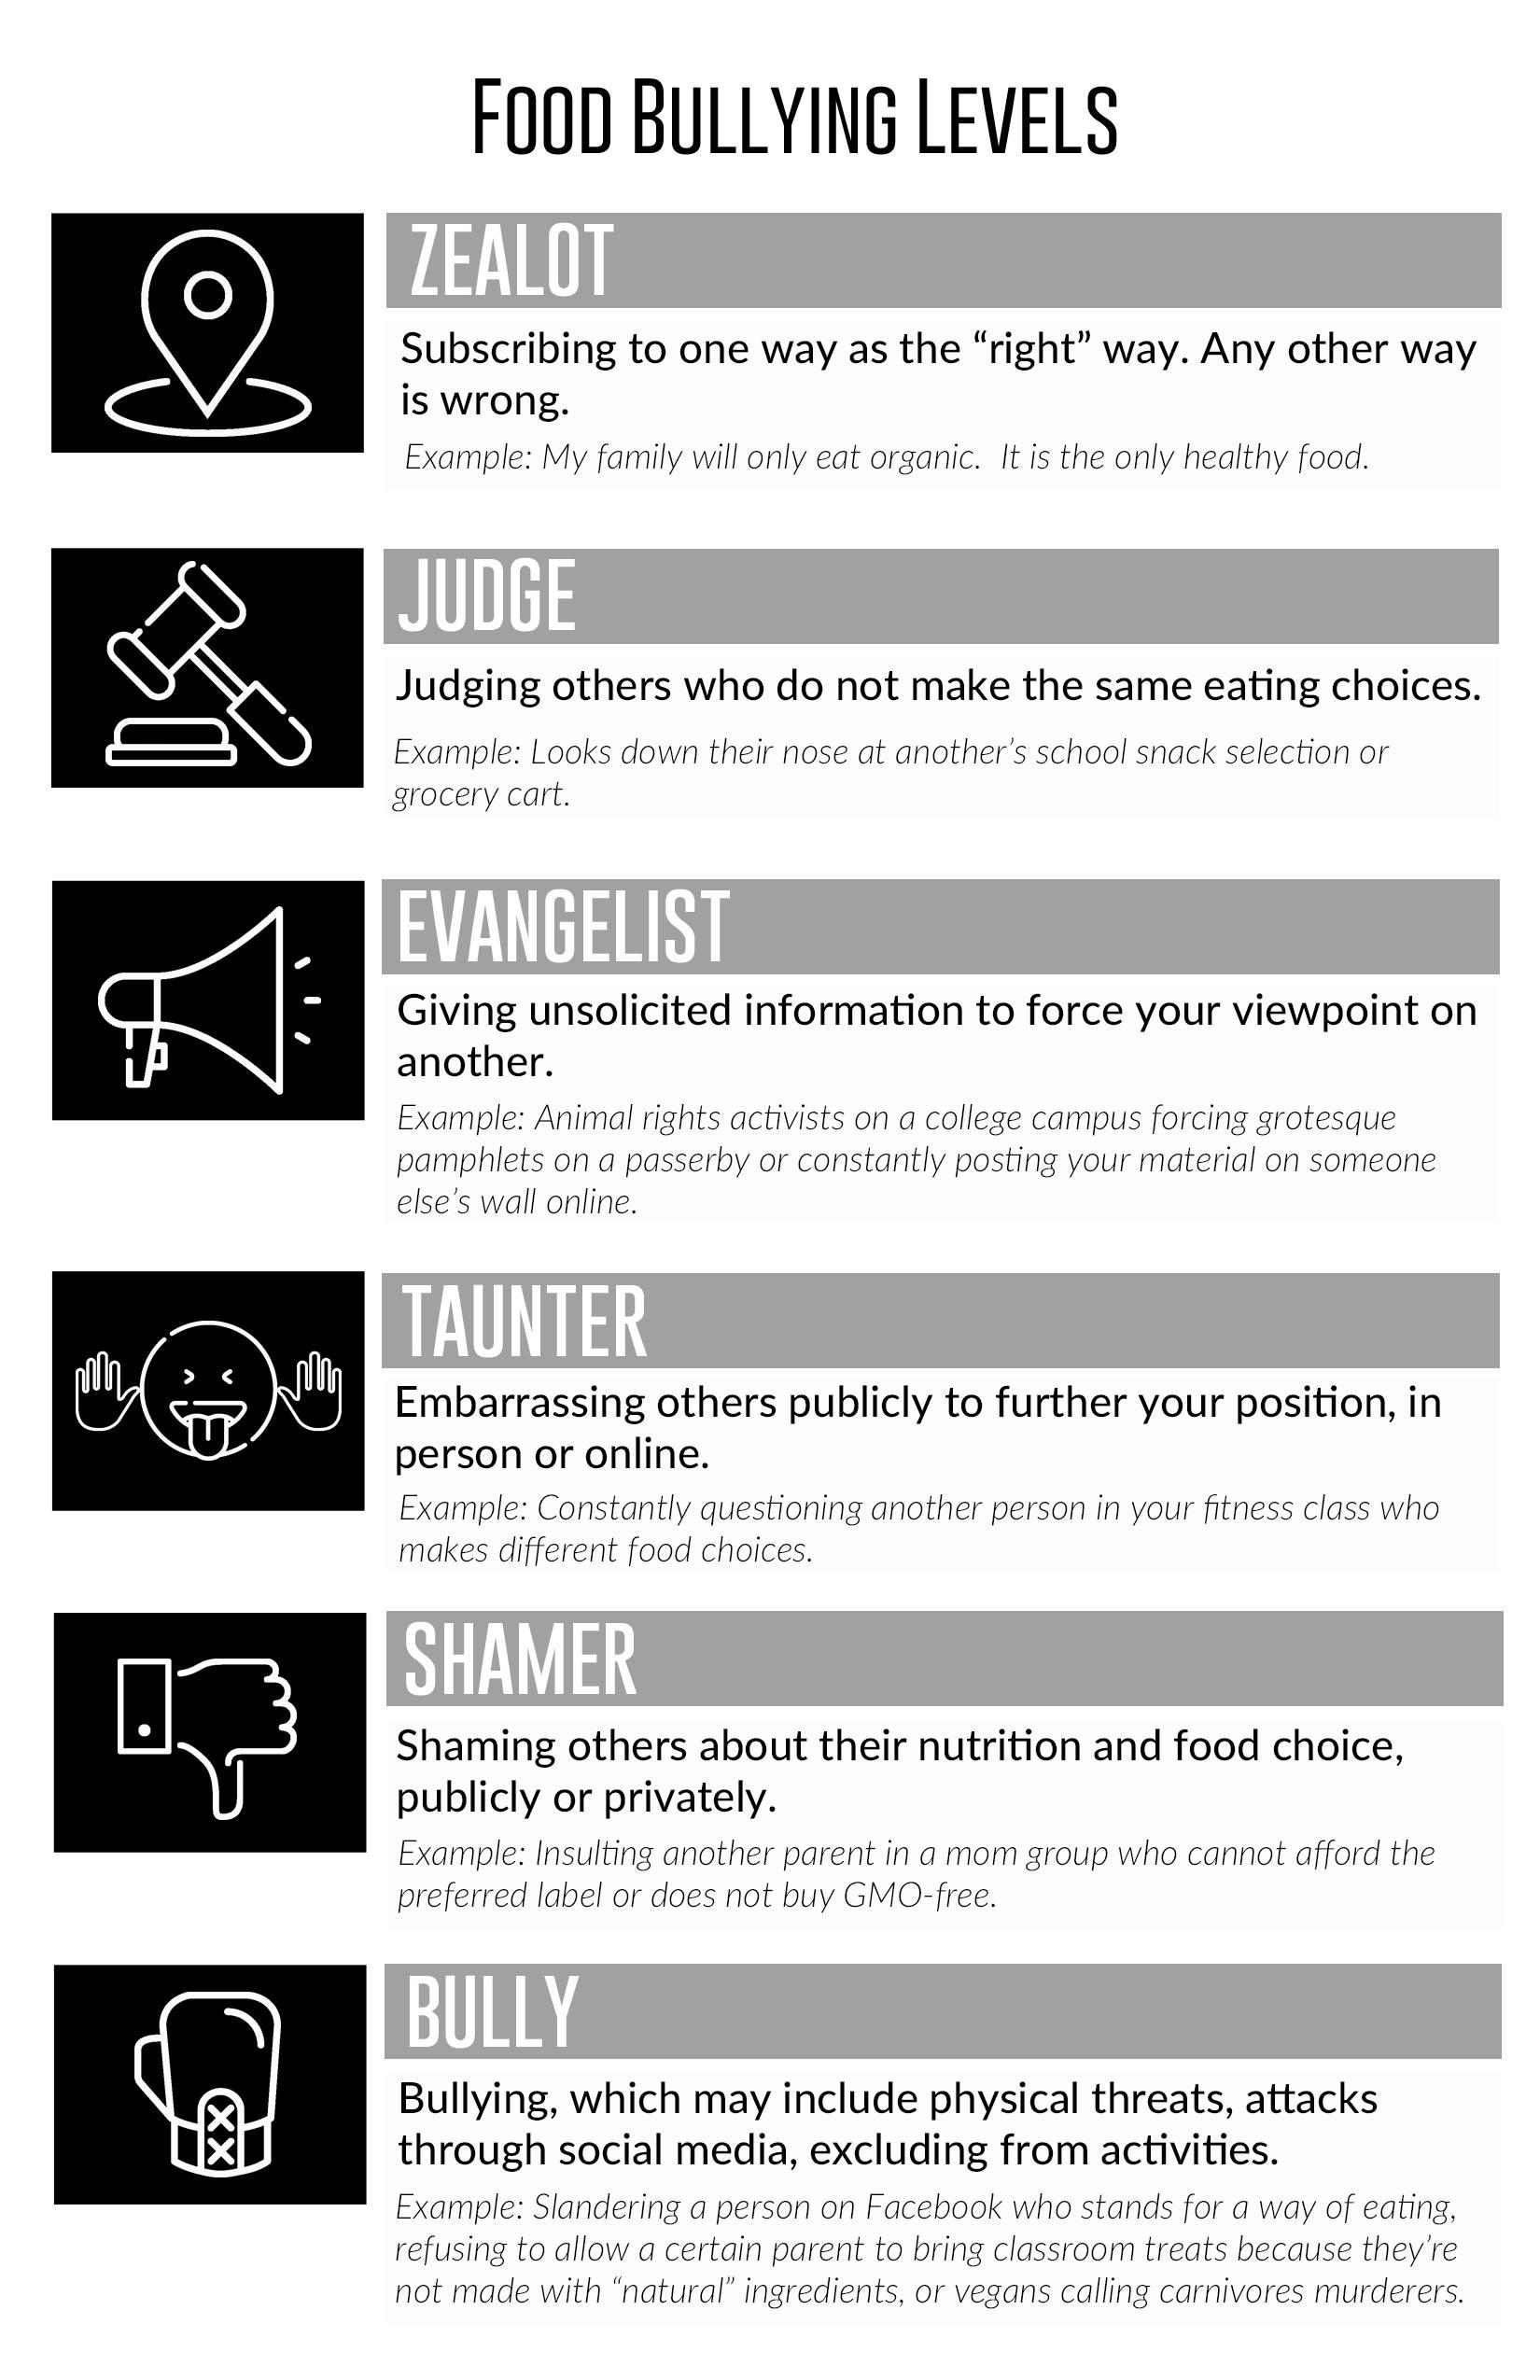 Levels of food bullying